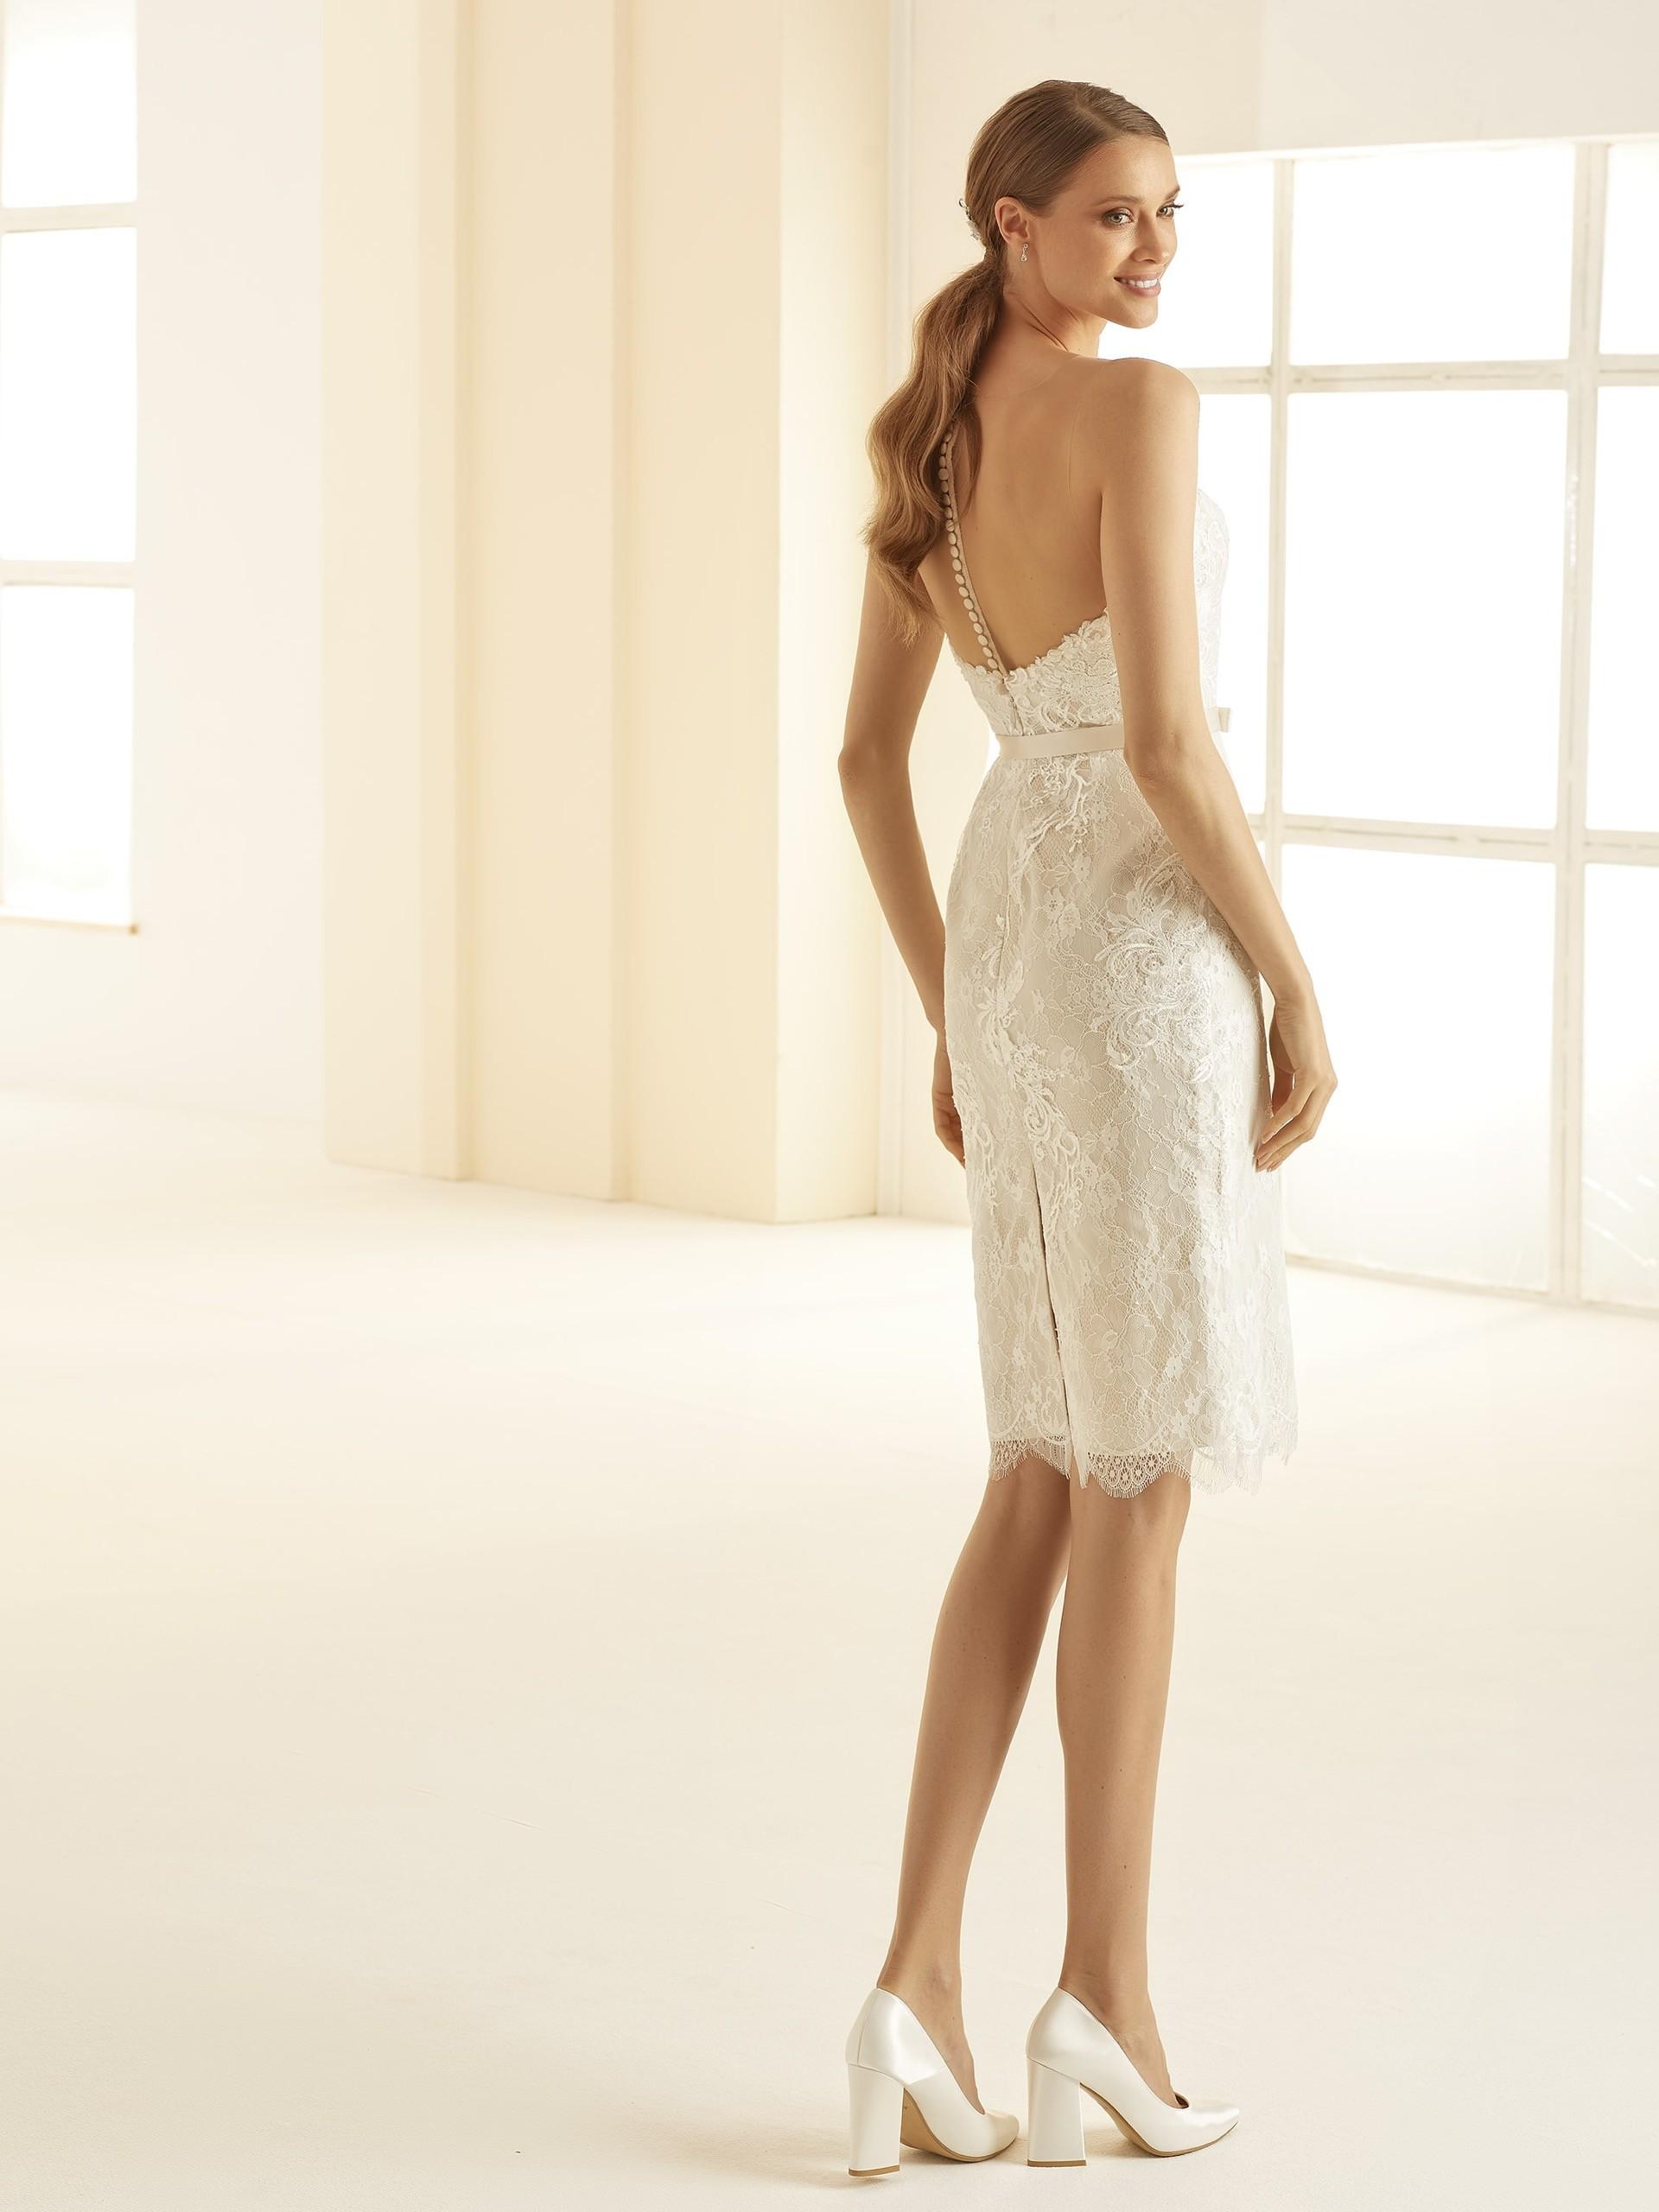 Kurzes Brautkleid Modell Naomi von Bianco Evento